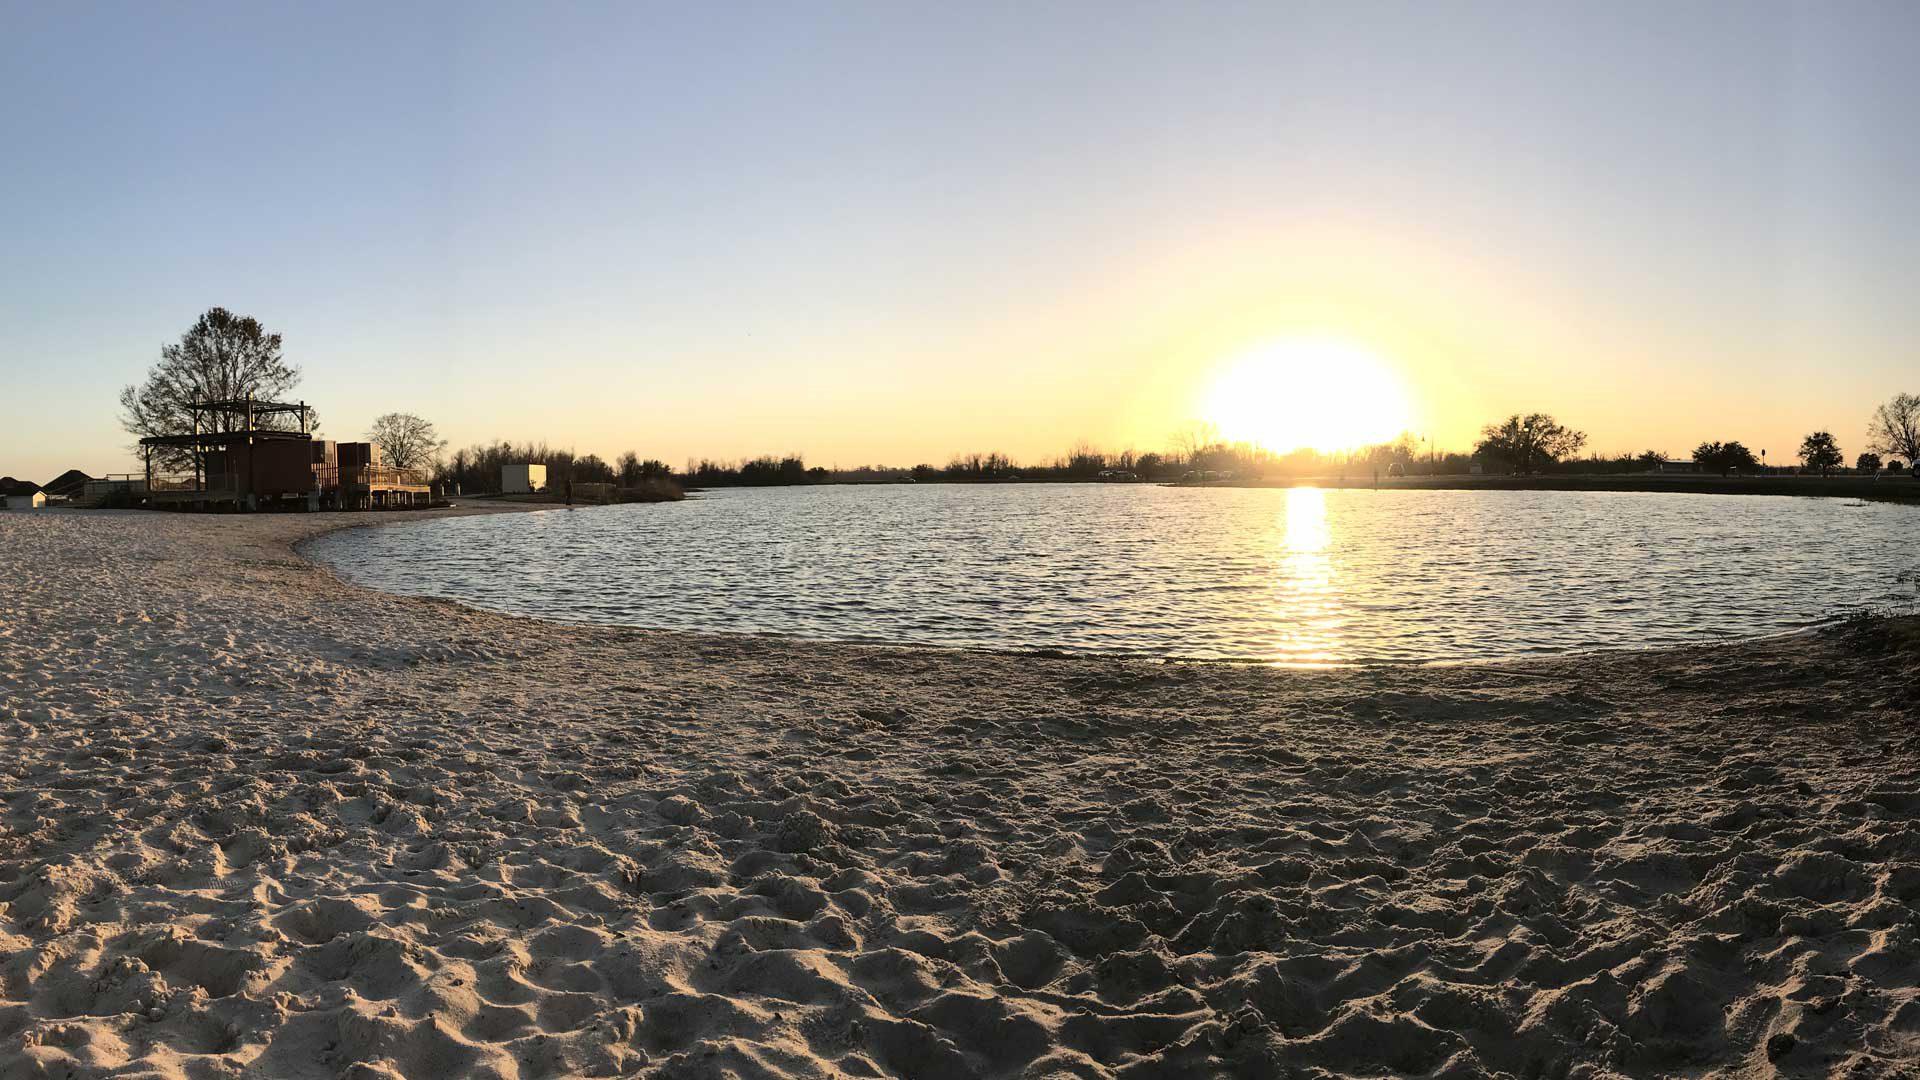 Photo of BCSP beach at sunset.